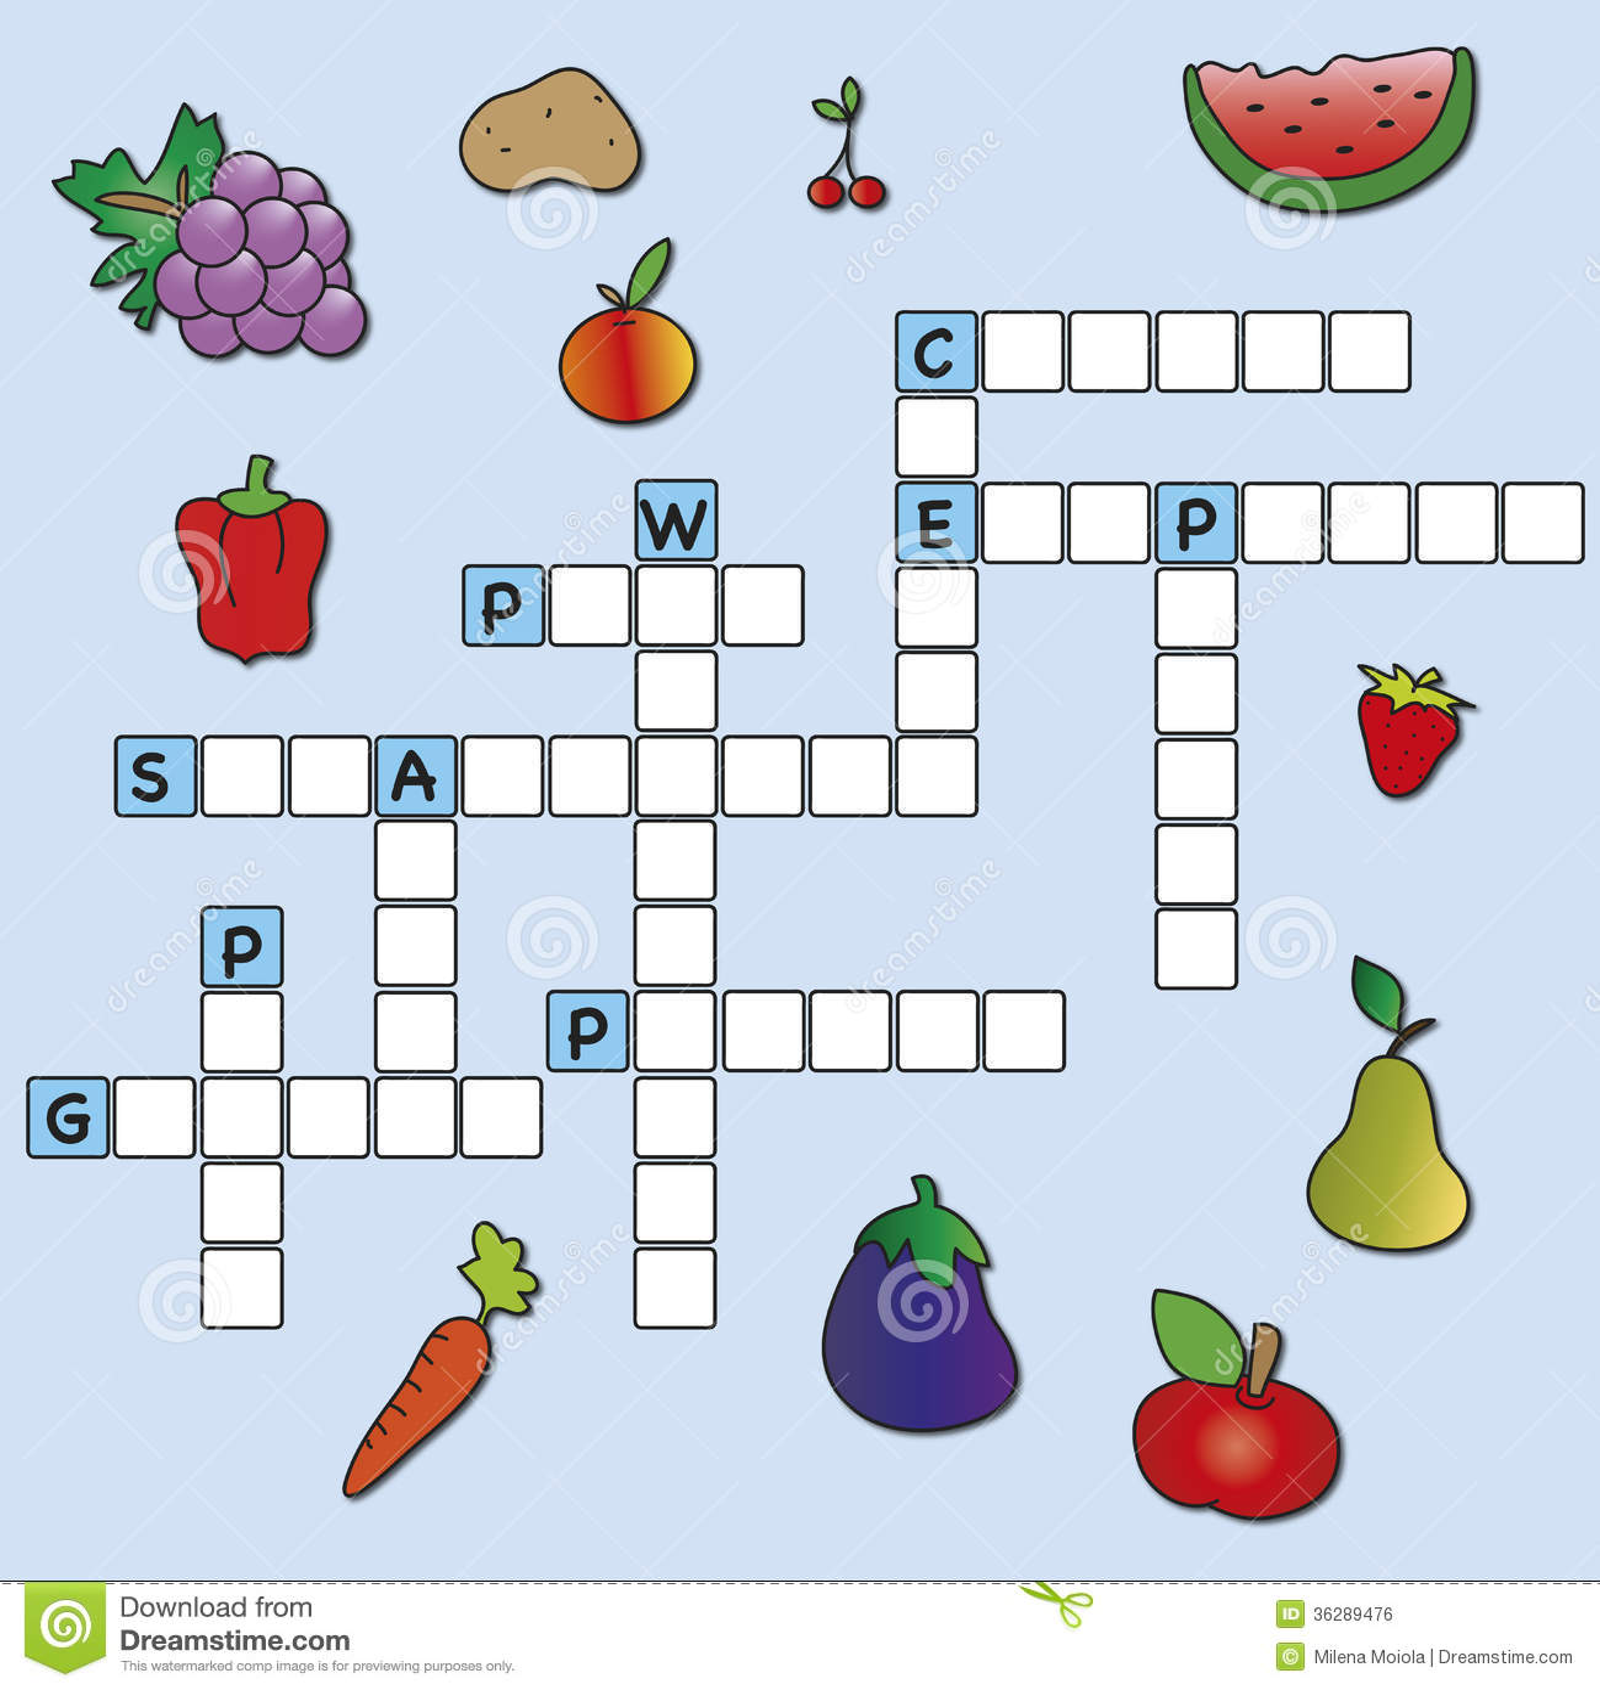 Crossword Stock Illustration Of Correct